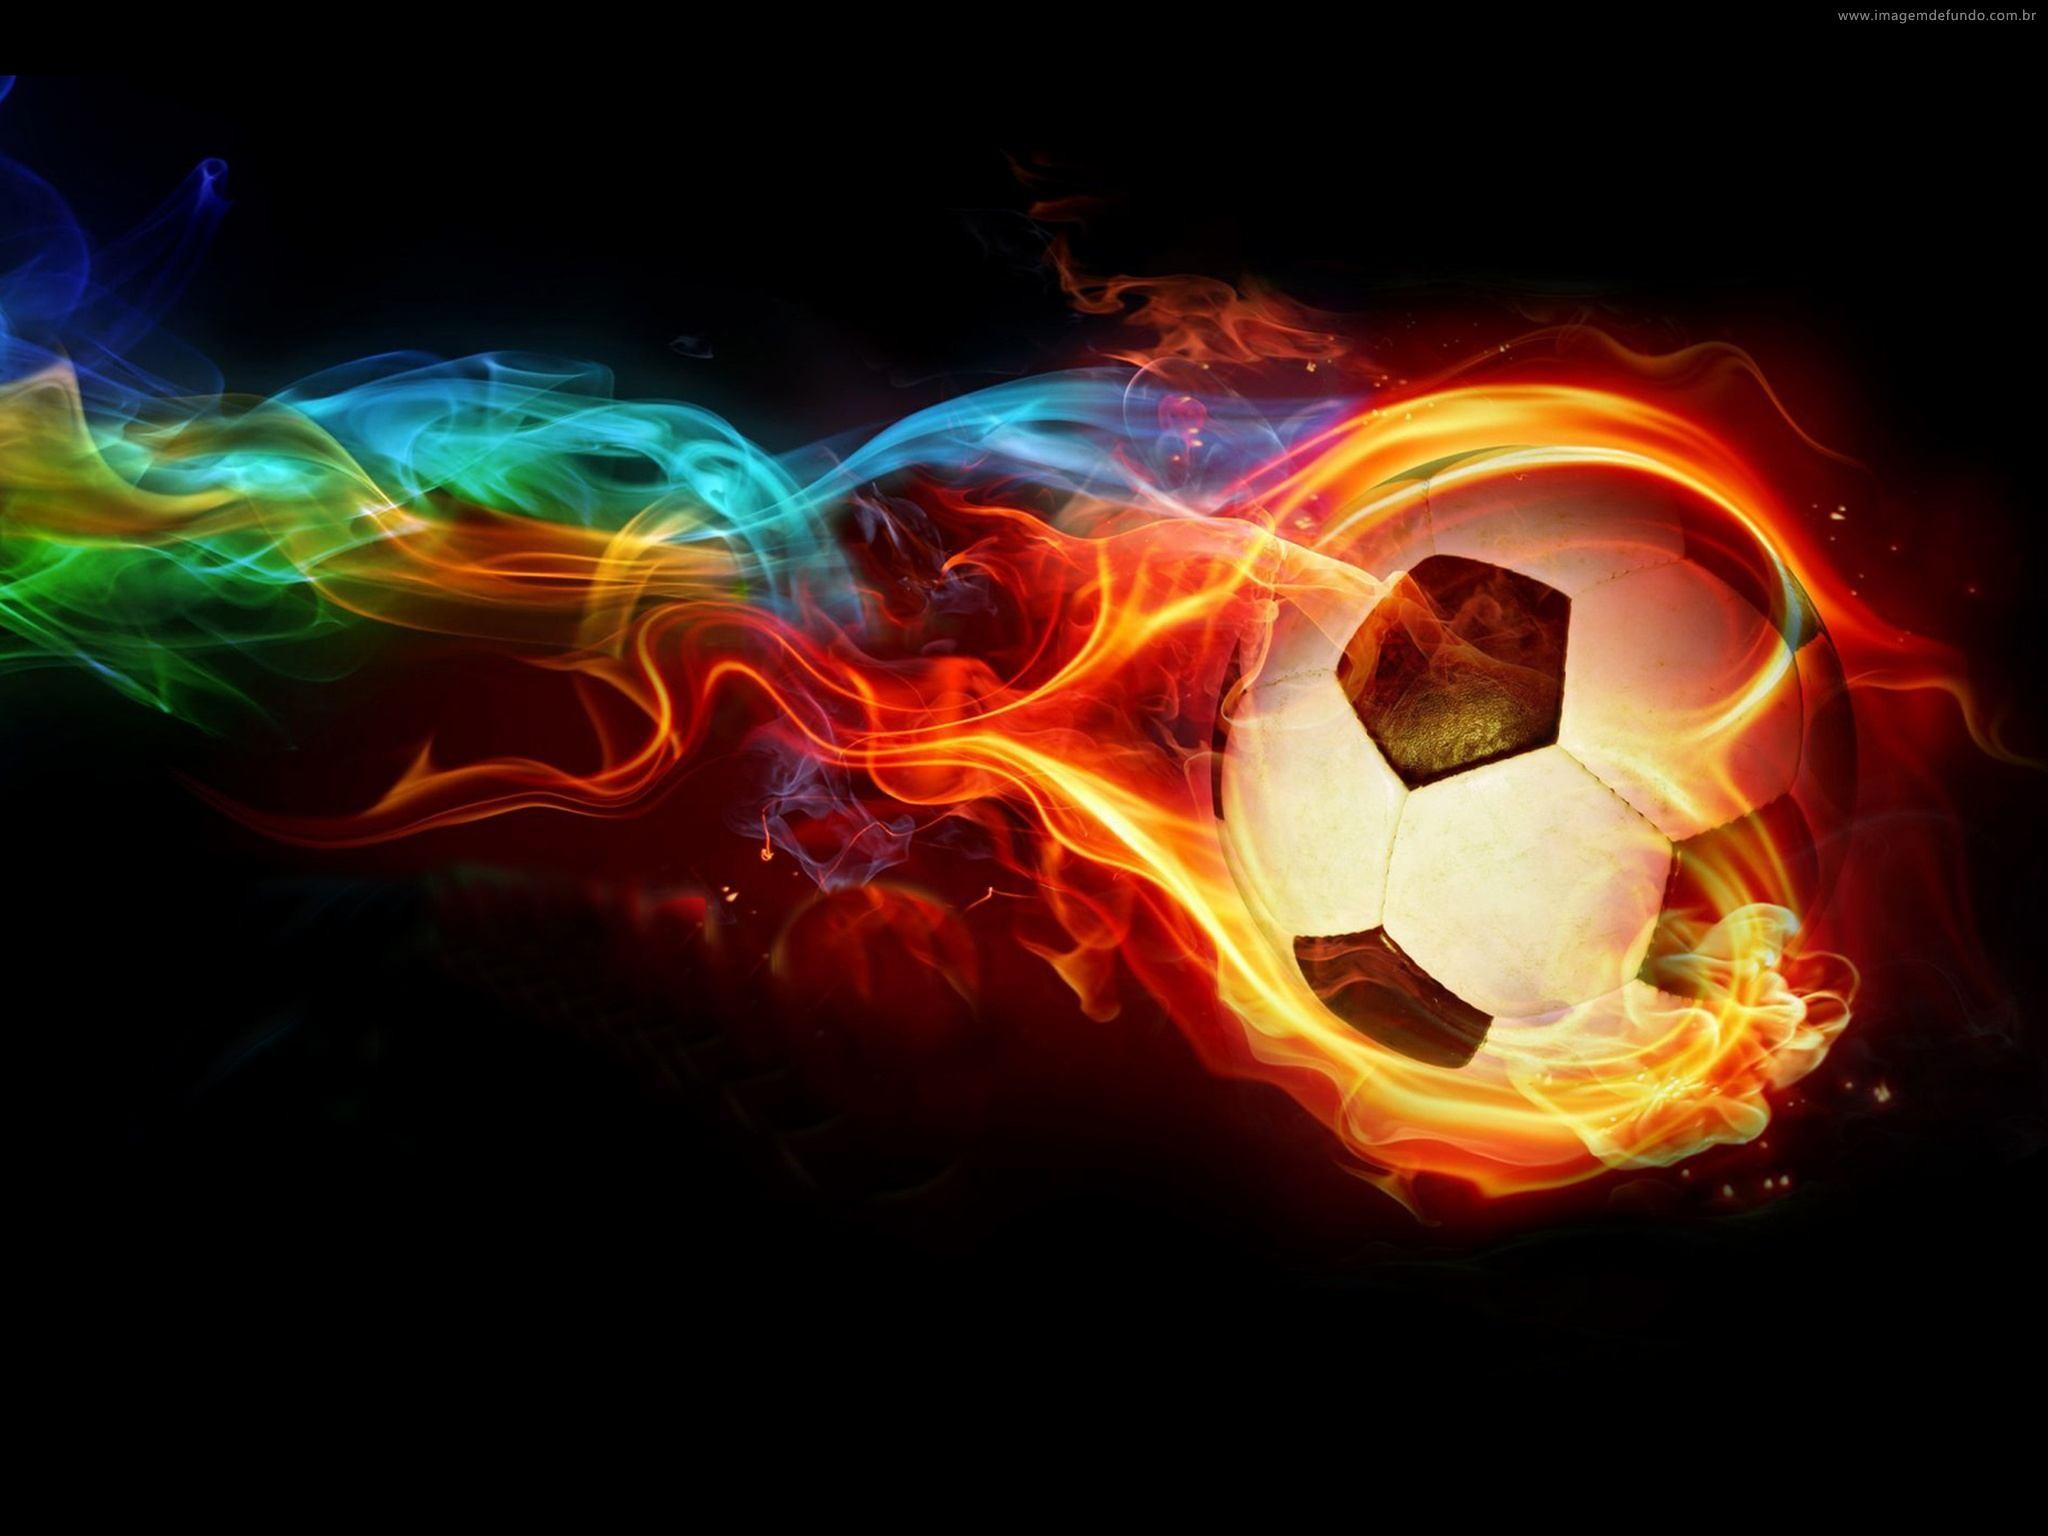 … soccer ball cool wallpapers awswallpapershd com …